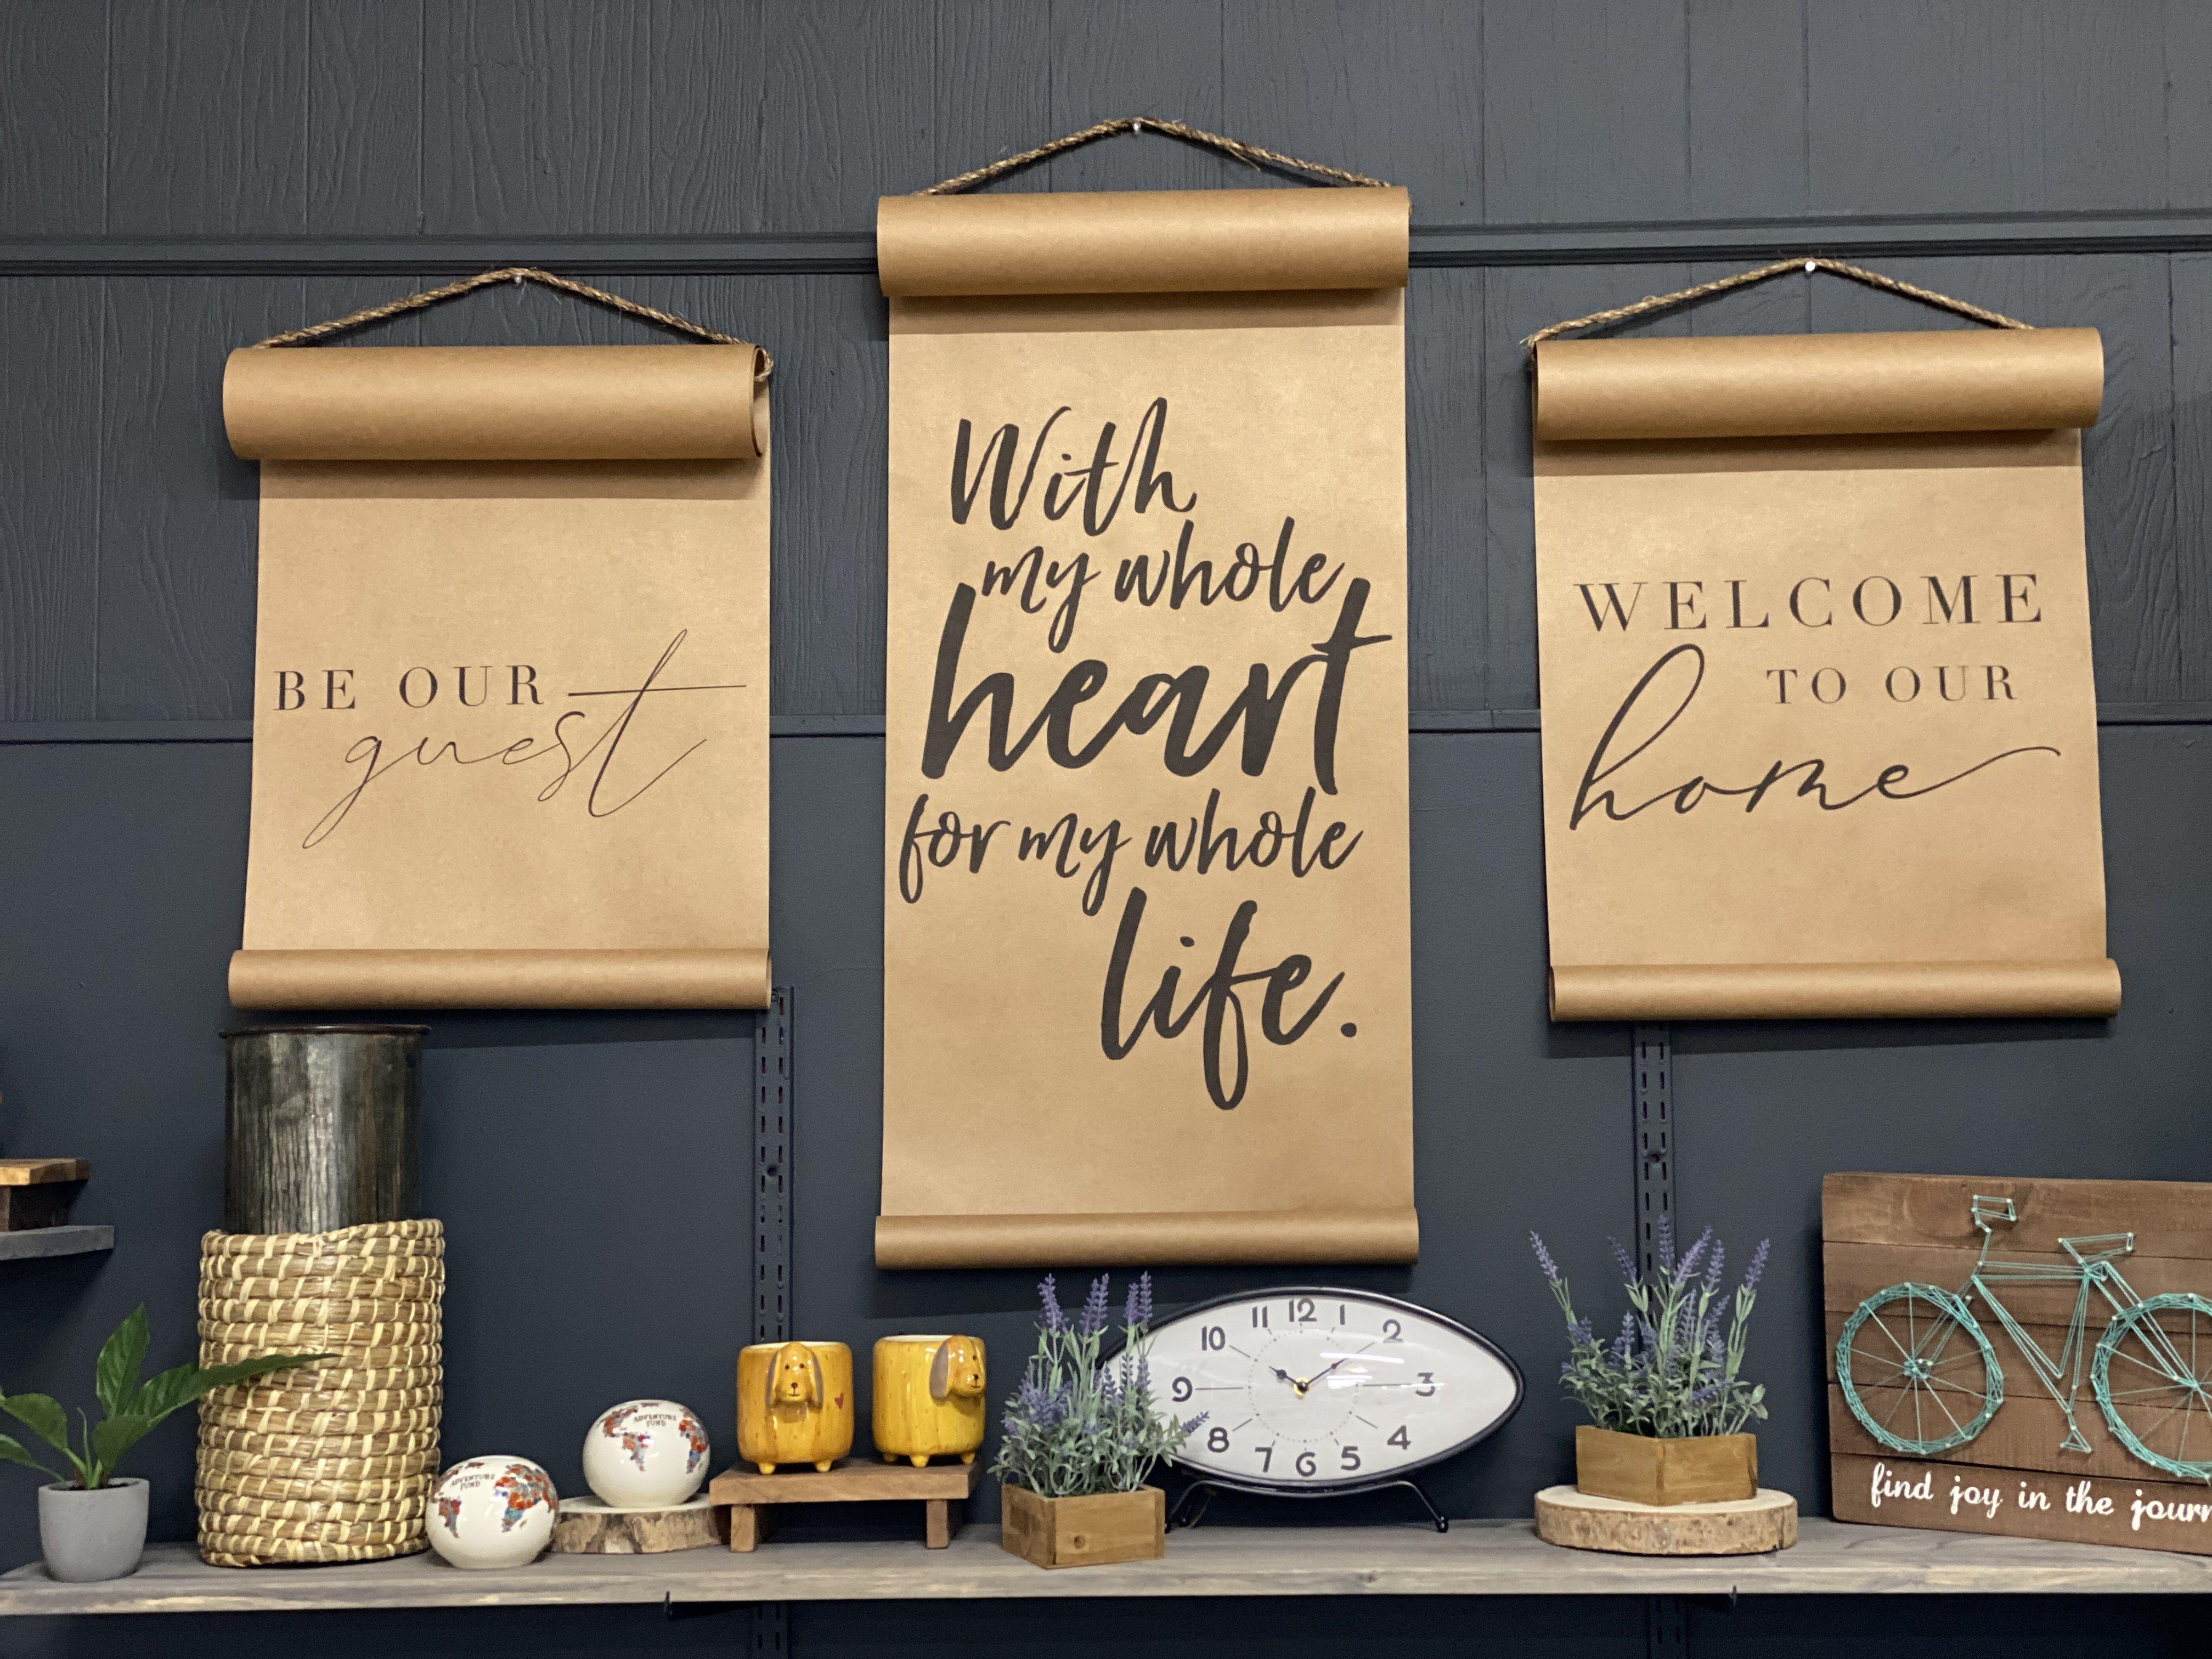 Kraft Paper Scrolls #homedecor #design #homeaccents #scrolls #kraftpaper #furniture